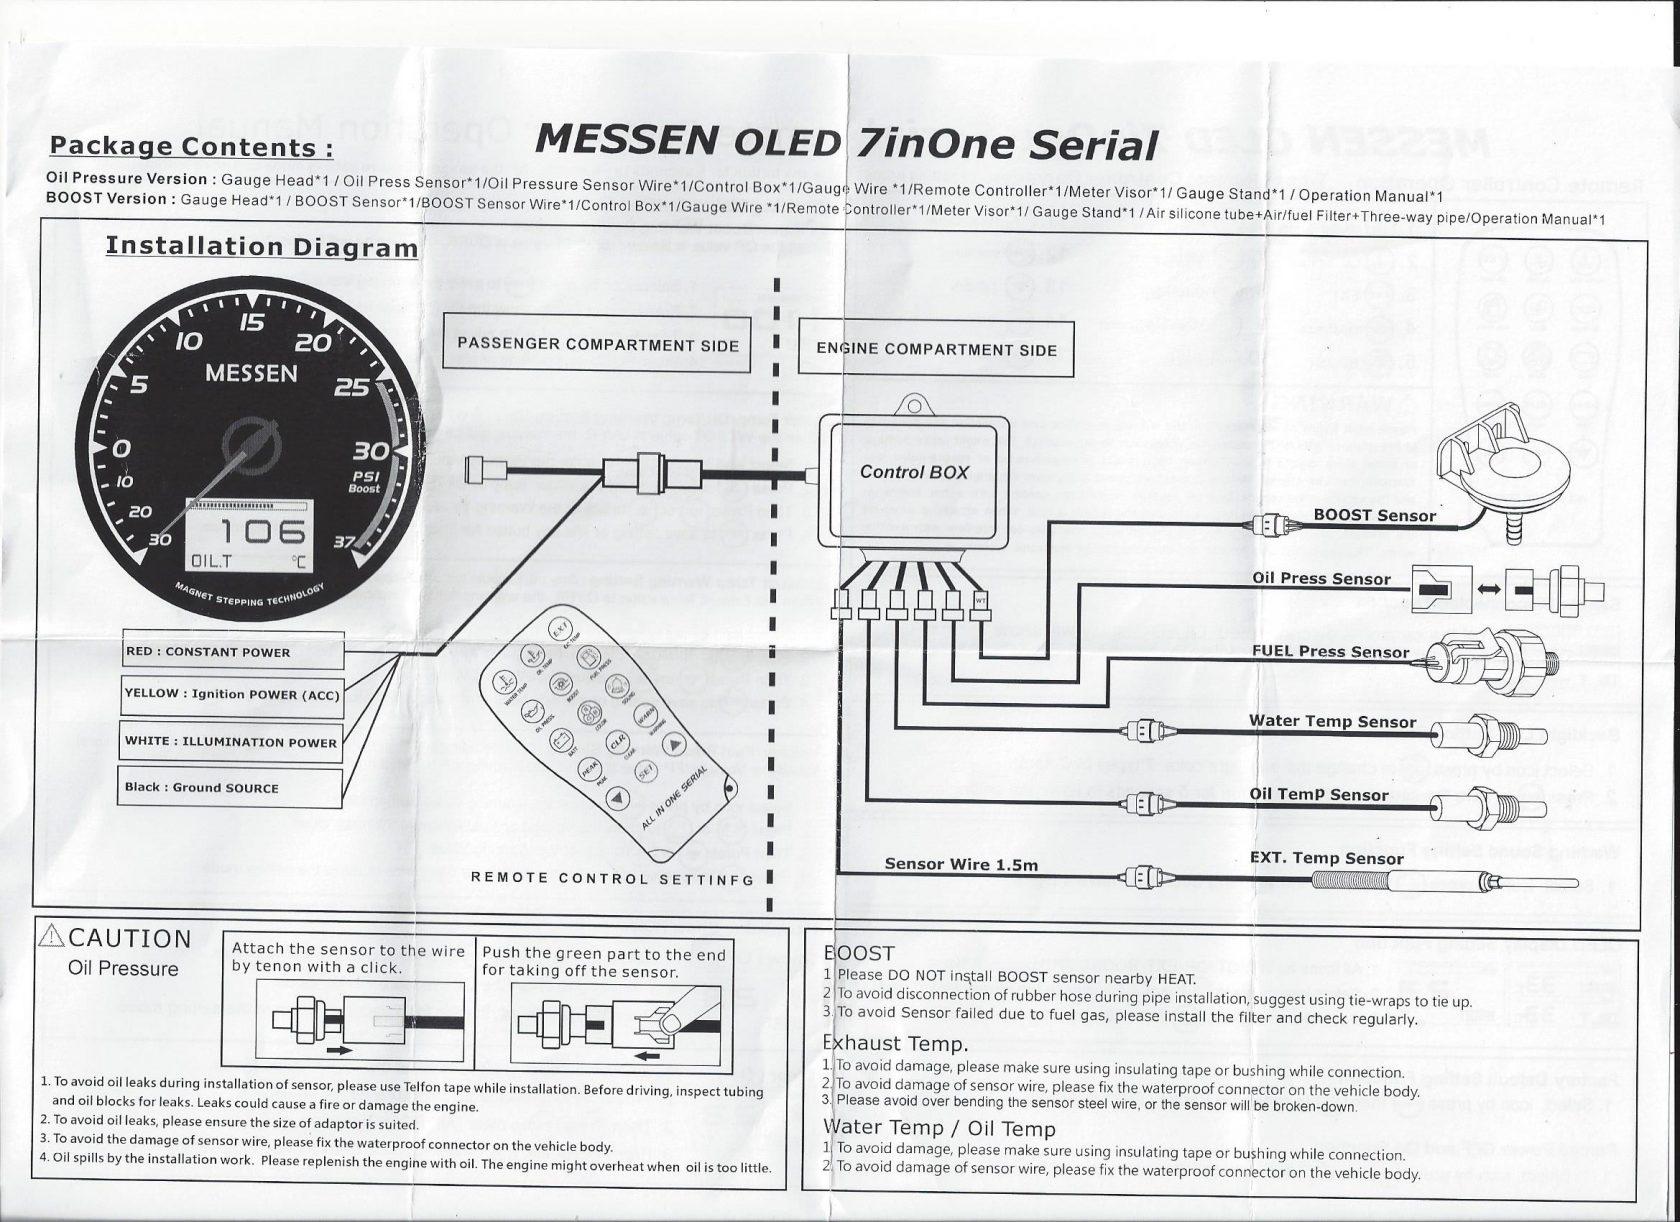 nitrous water temp gauge wiring diagram how to draw plc e06lj arbeitujobs de glowshift air fuel ratio 8 10 stromoeko u2022 rh